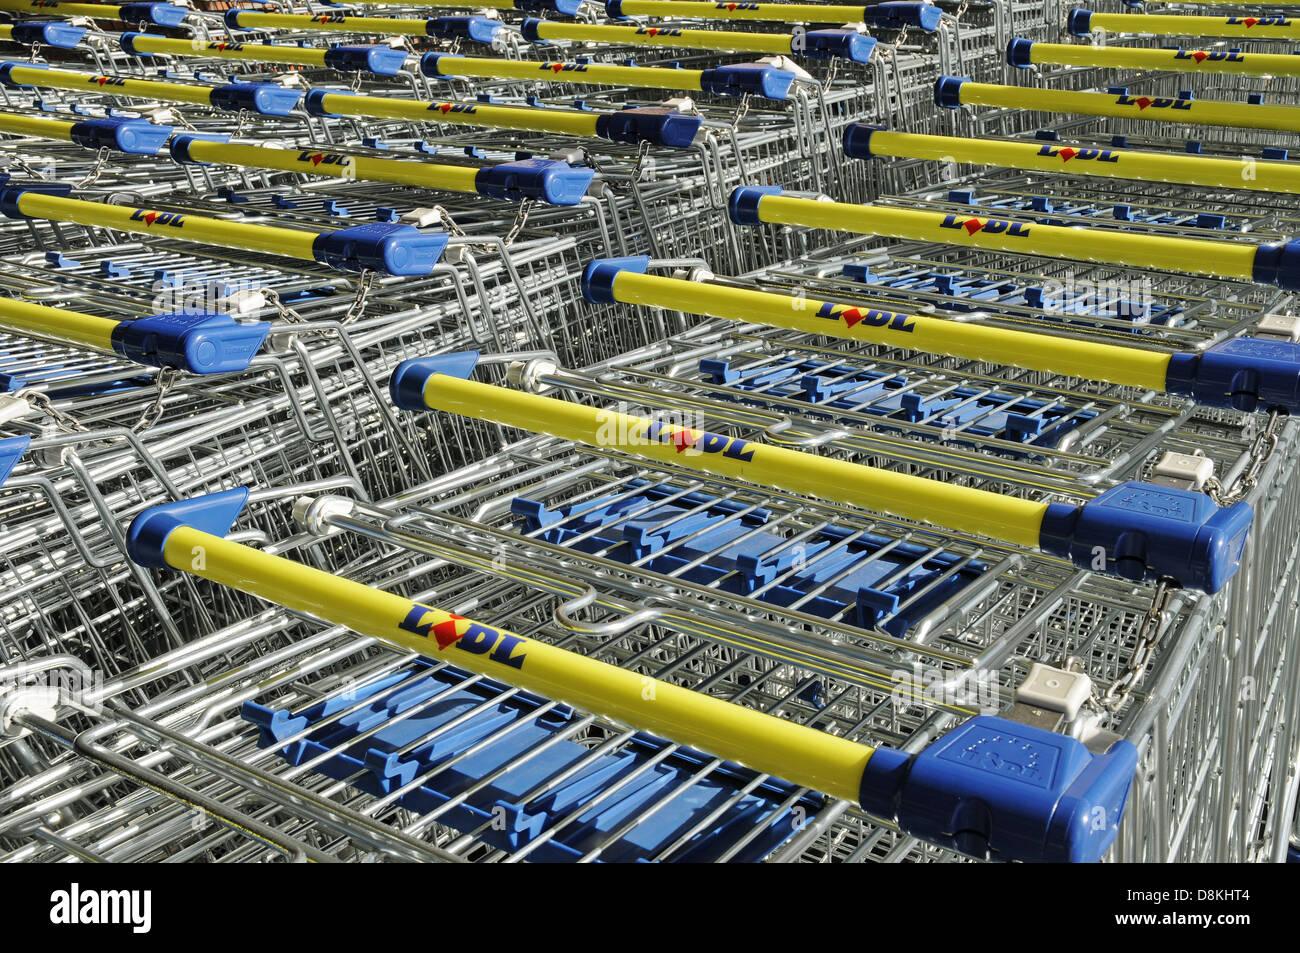 Shopping Cart - Stock Image